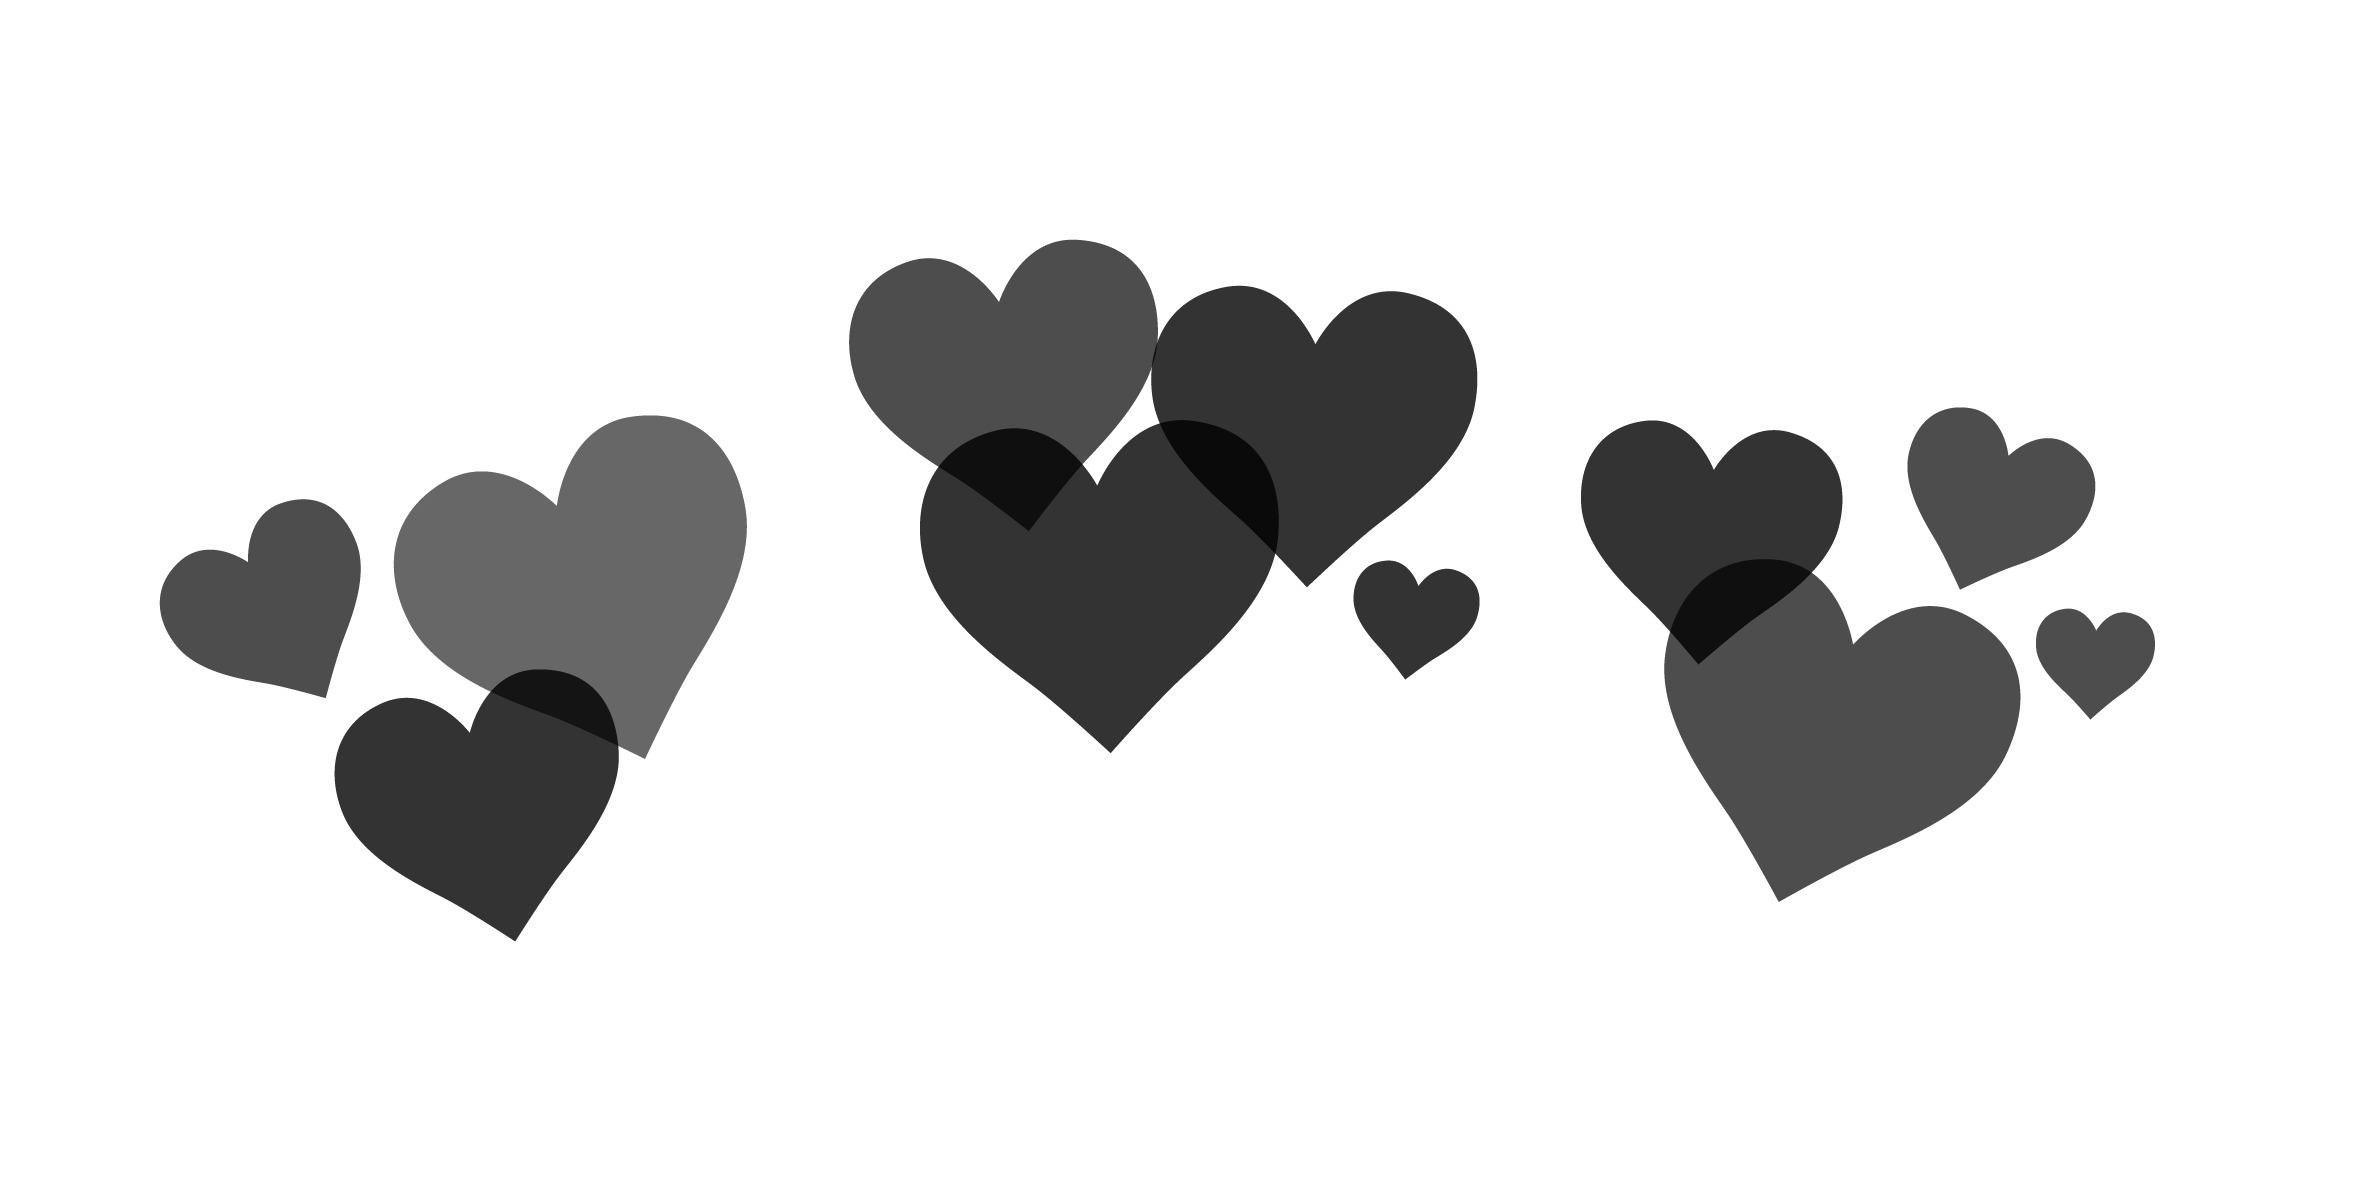 Crown drawing transparent izmirmasajfo